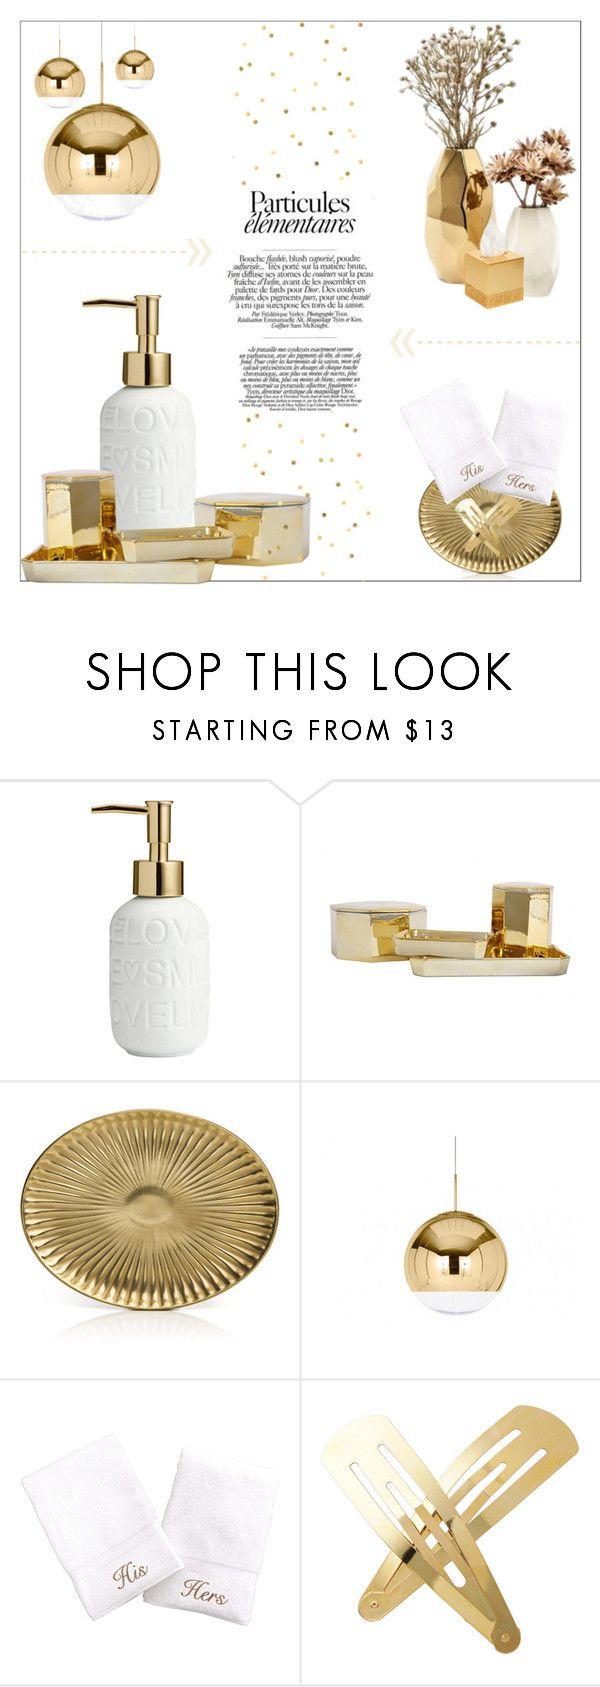 """Gold"" by lulunam ❤ liked on Polyvore featuring interior, interiors, interior design, home, home decor, interior decorating, Jayson Home, Villari, Linum Home Textiles and Adia Kibur"